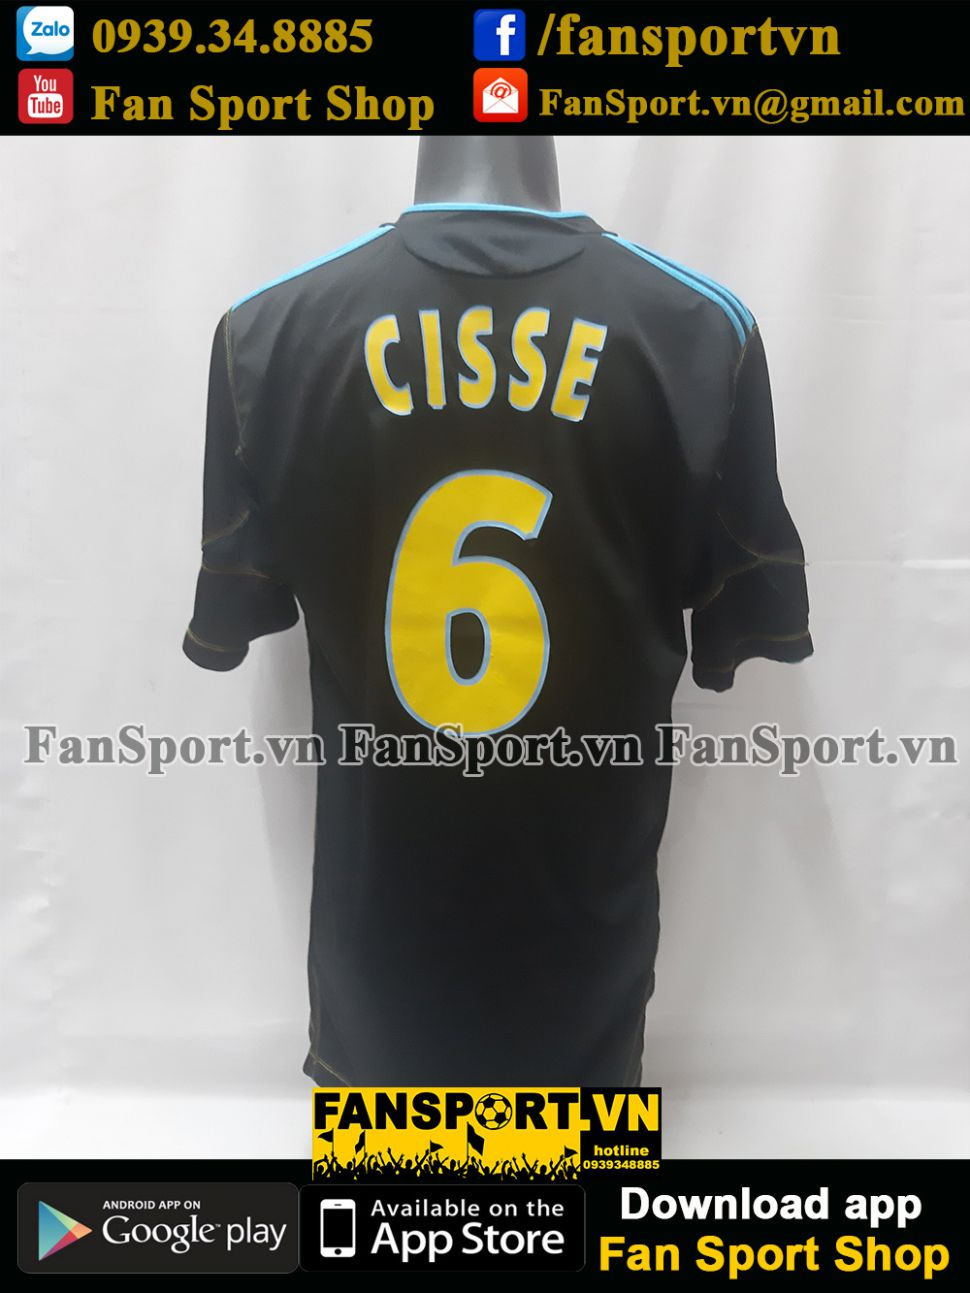 Áo đấu Cisse 6 Marrseille 2010 2011 third shirt jersey black